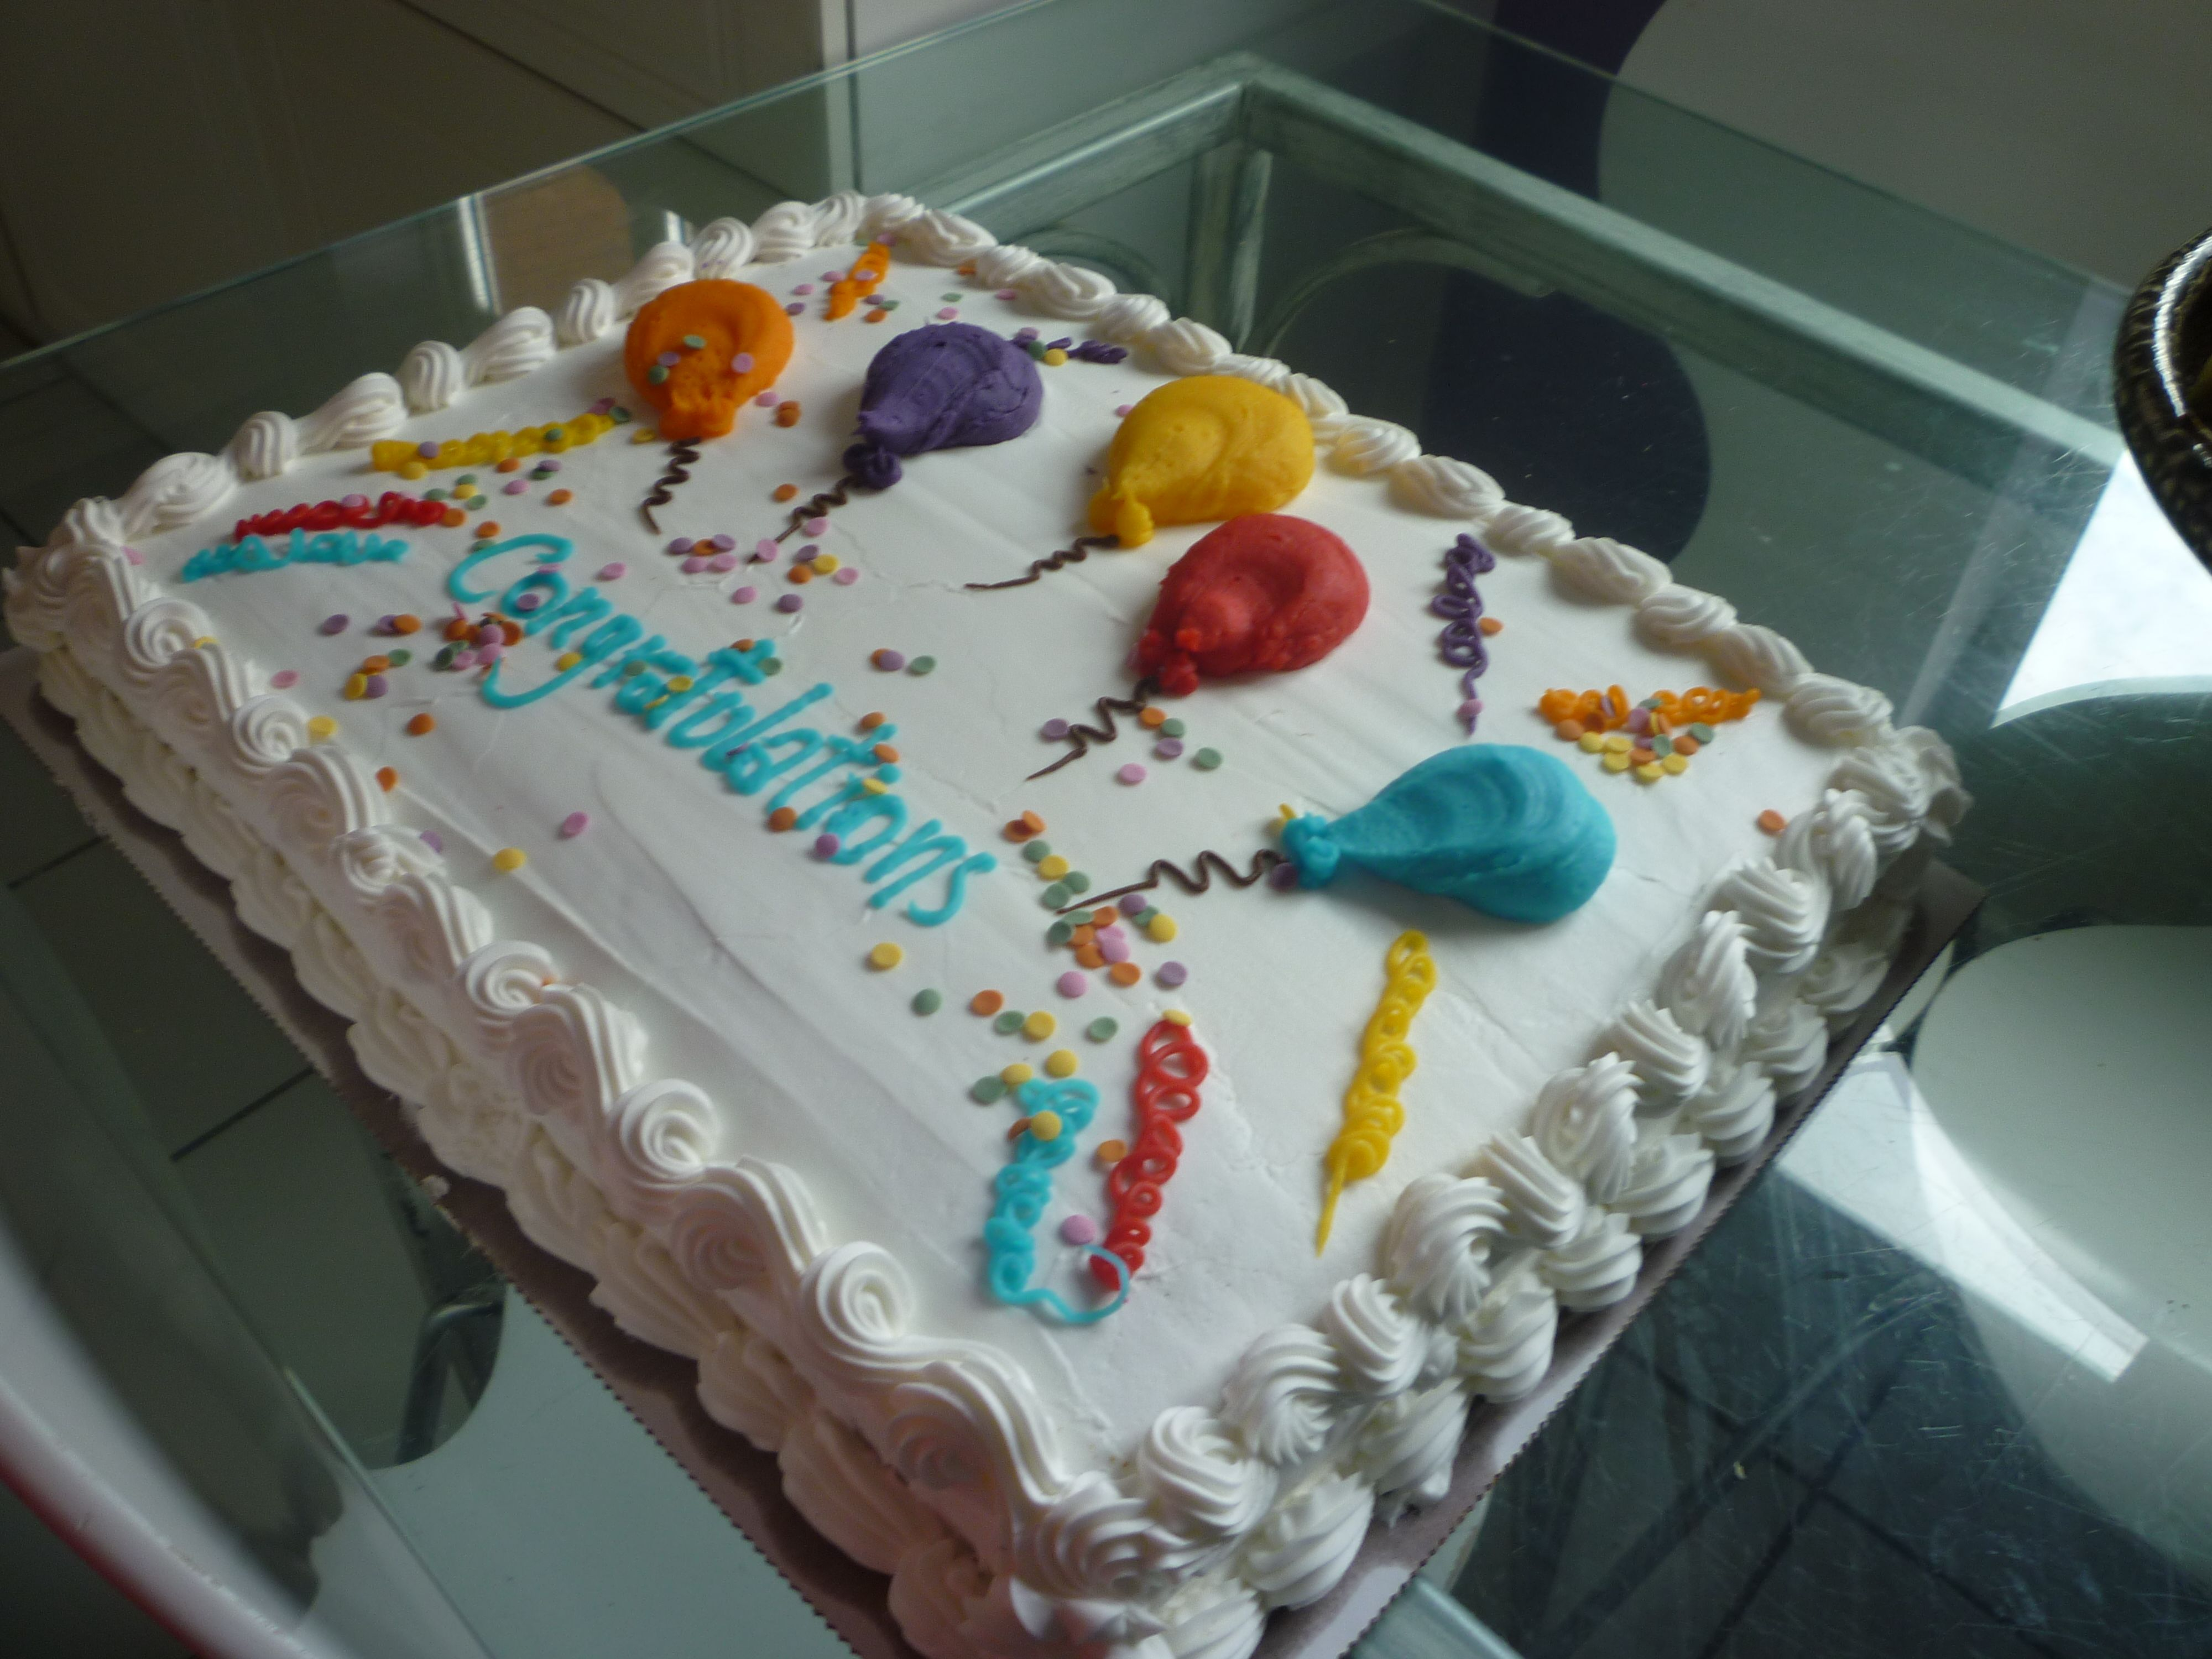 Groovy 7 Costco Bakery Birthday Cakes Cupcakes Photo Costco Bakery Funny Birthday Cards Online Aboleapandamsfinfo